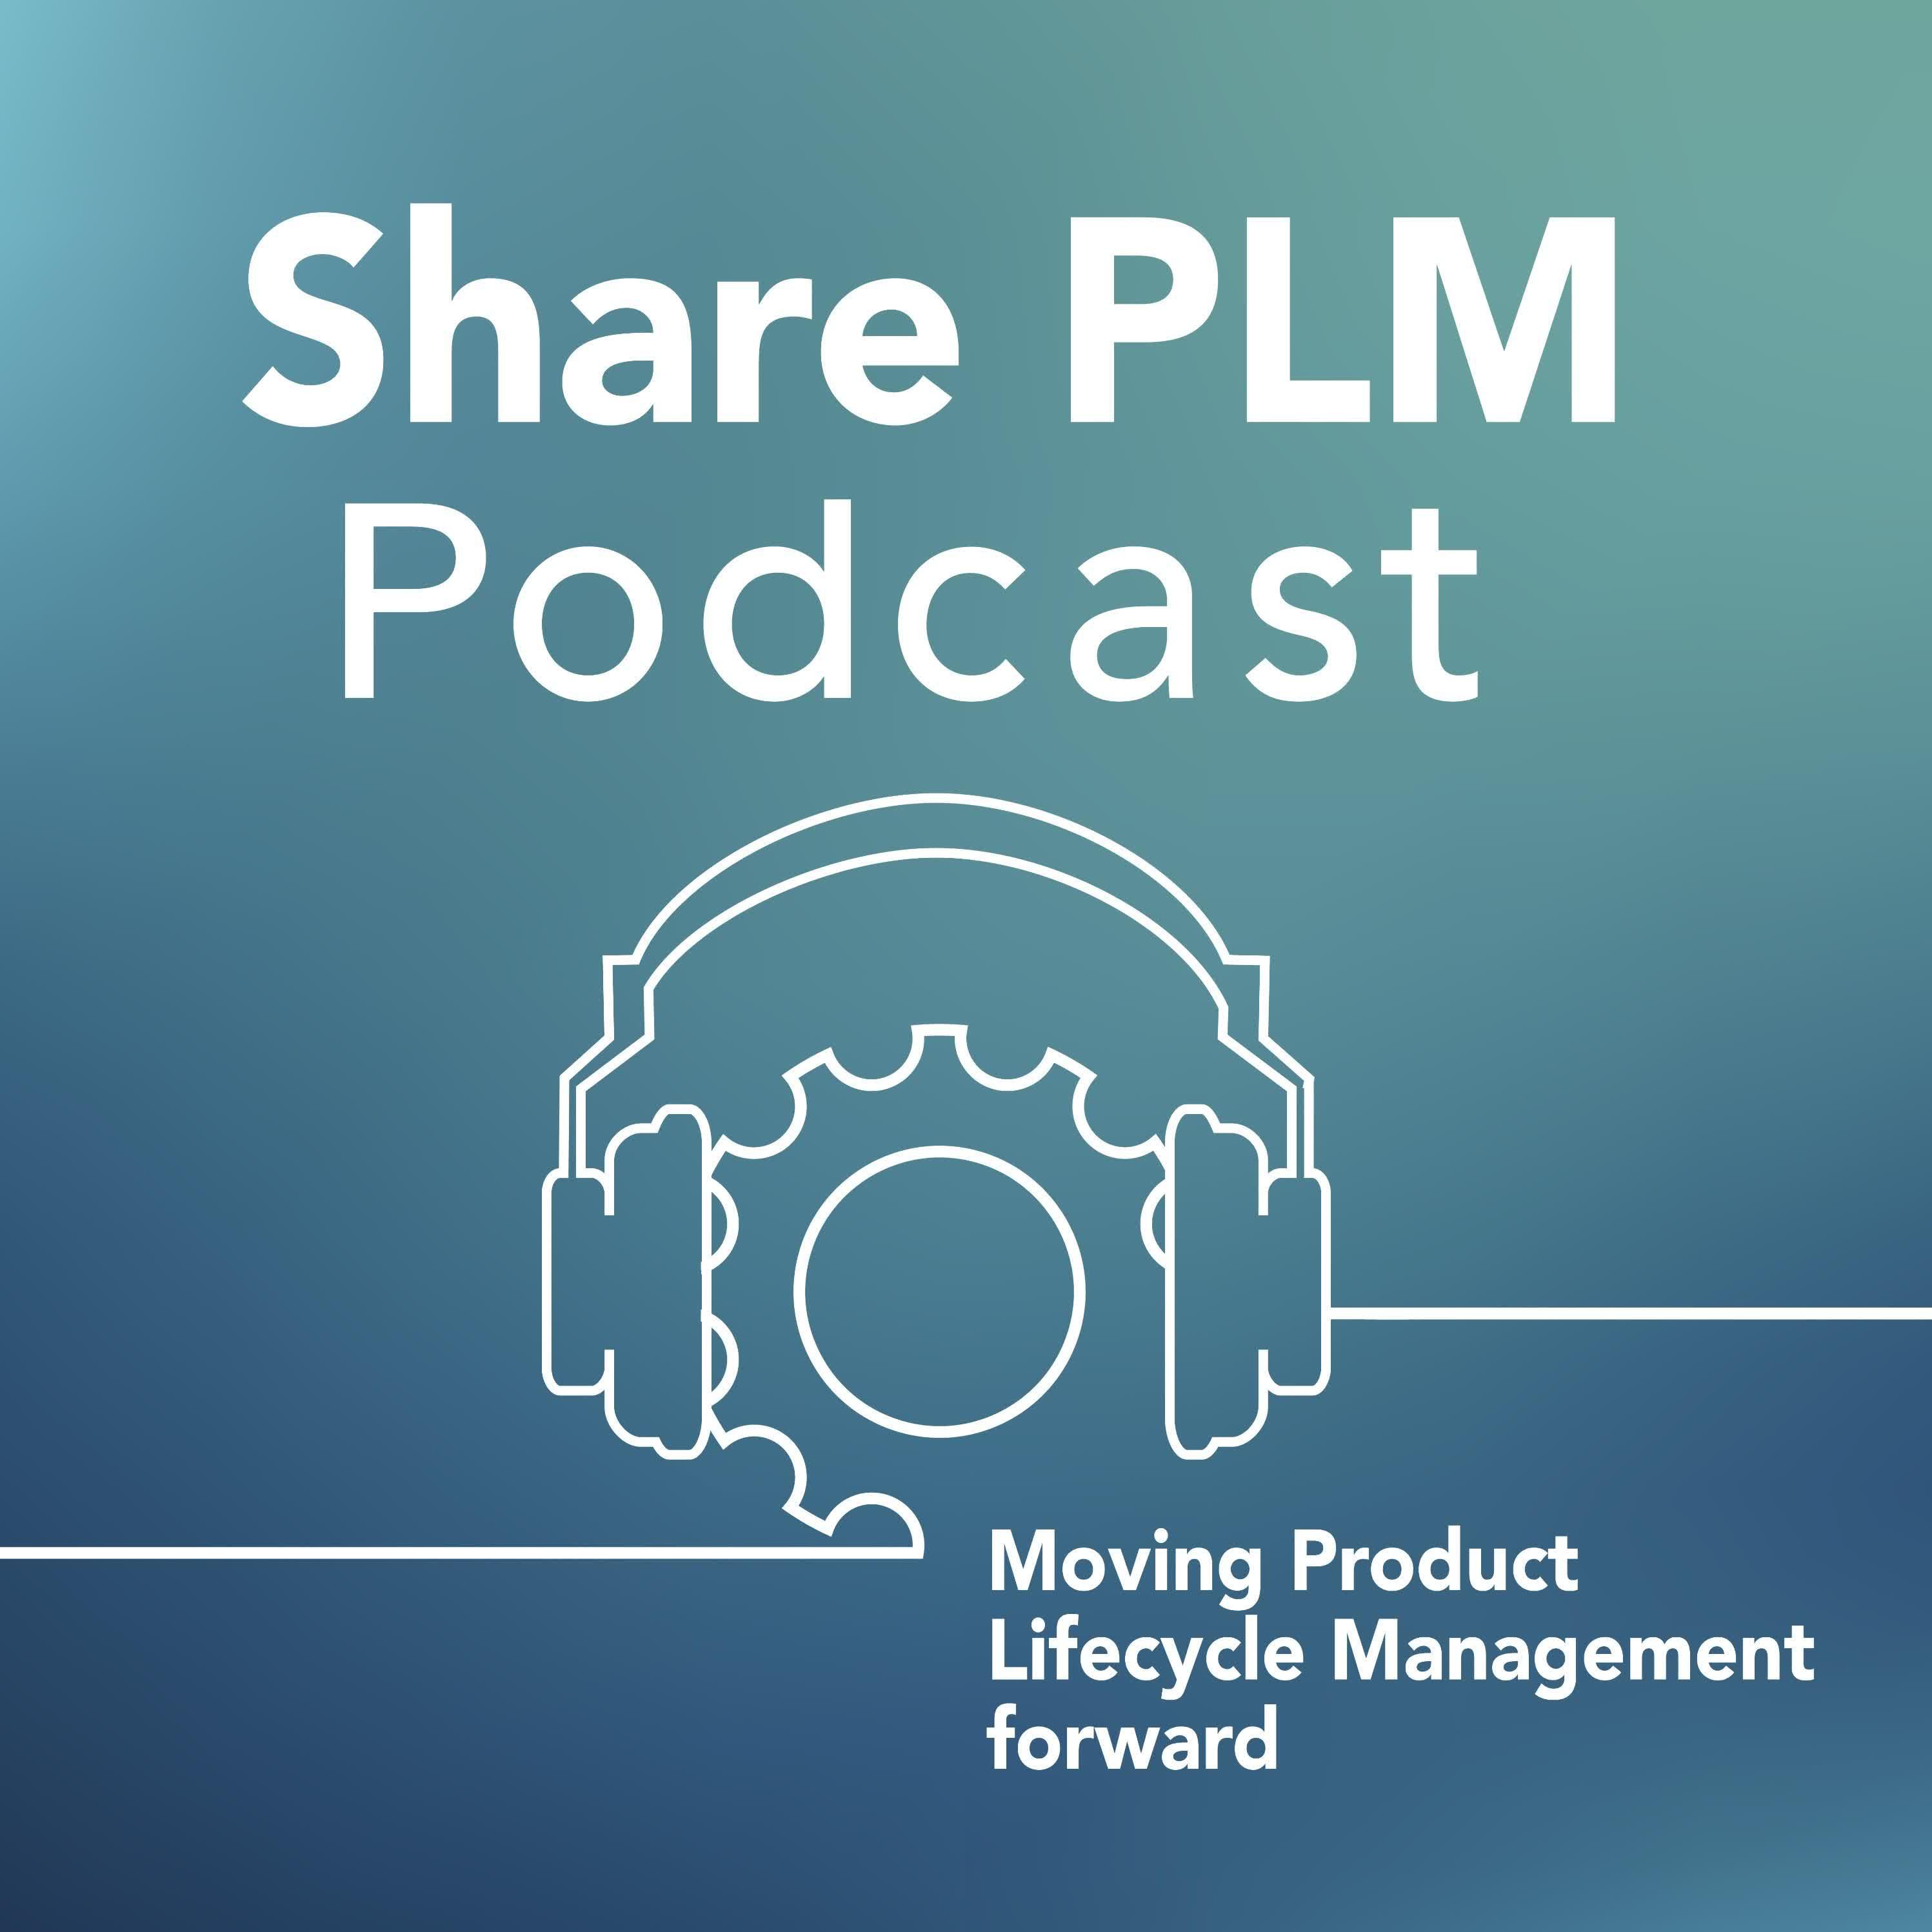 Share PLM Podcast